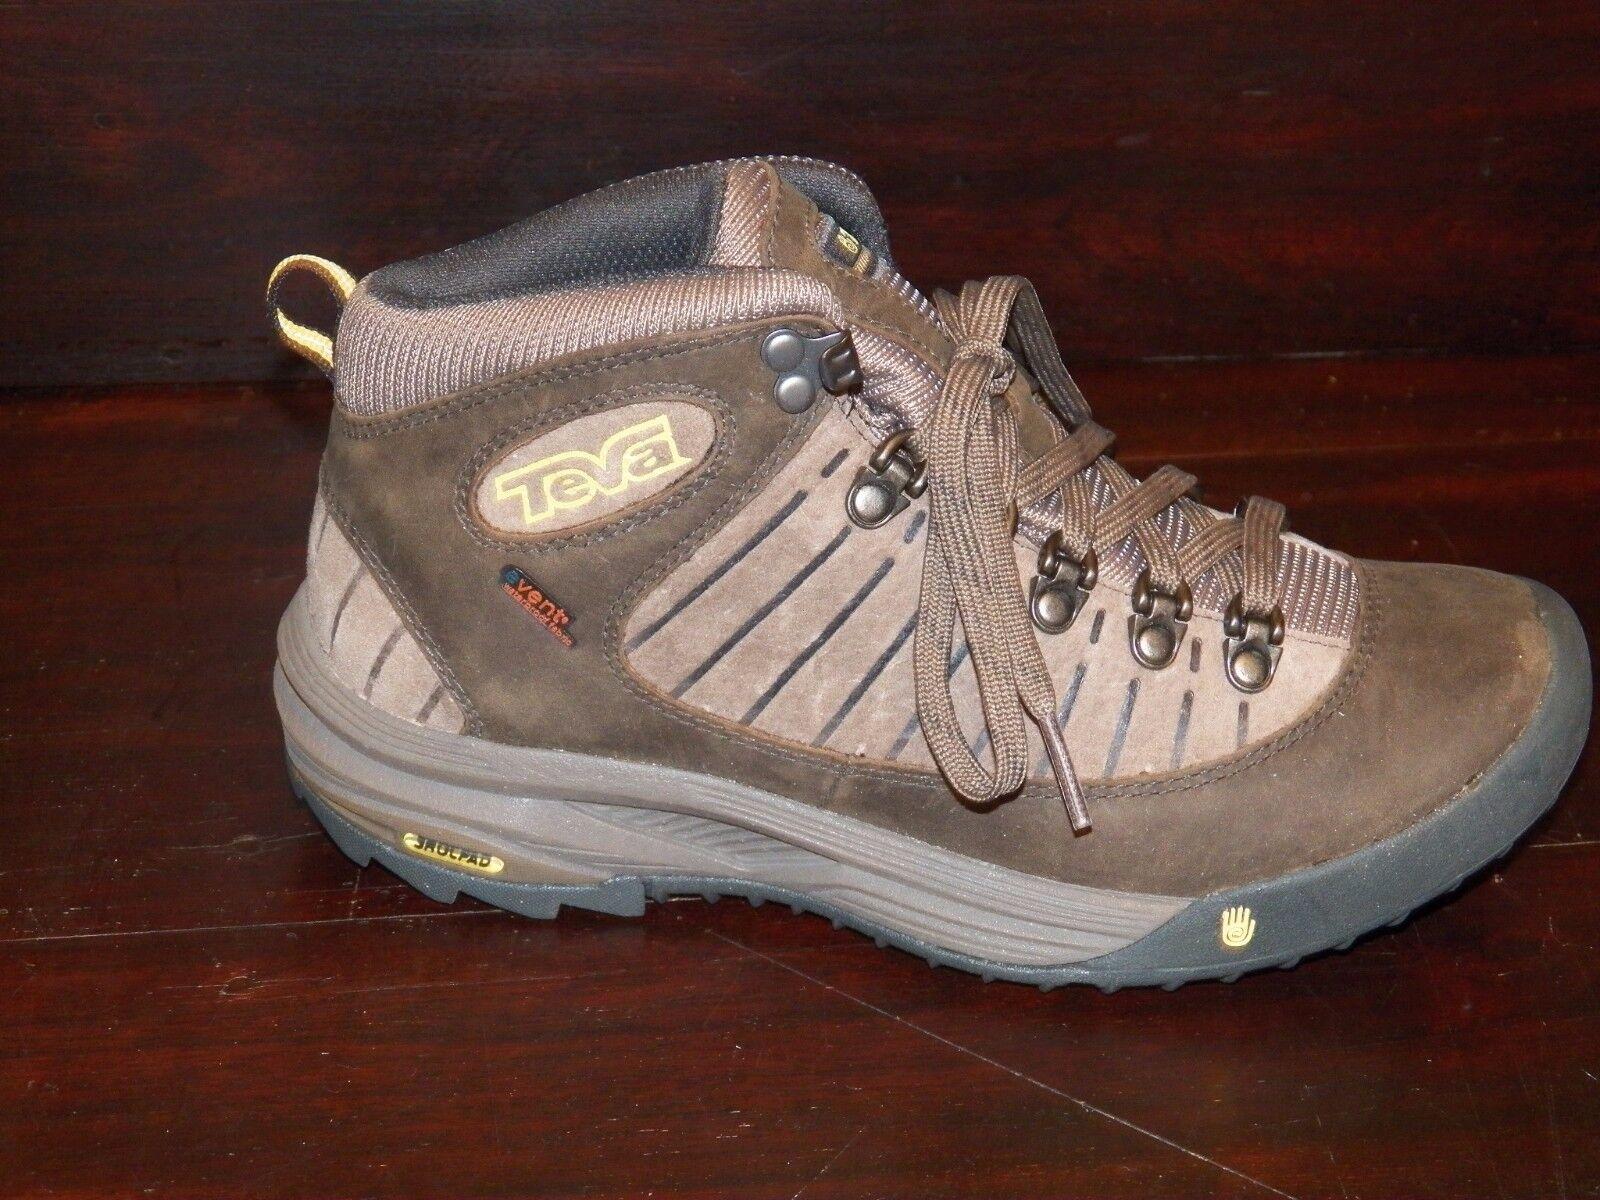 New Damenschuhe TEVA Forge Pro Mid eVent Leder Braun Hiking Trail Walking Schuhes